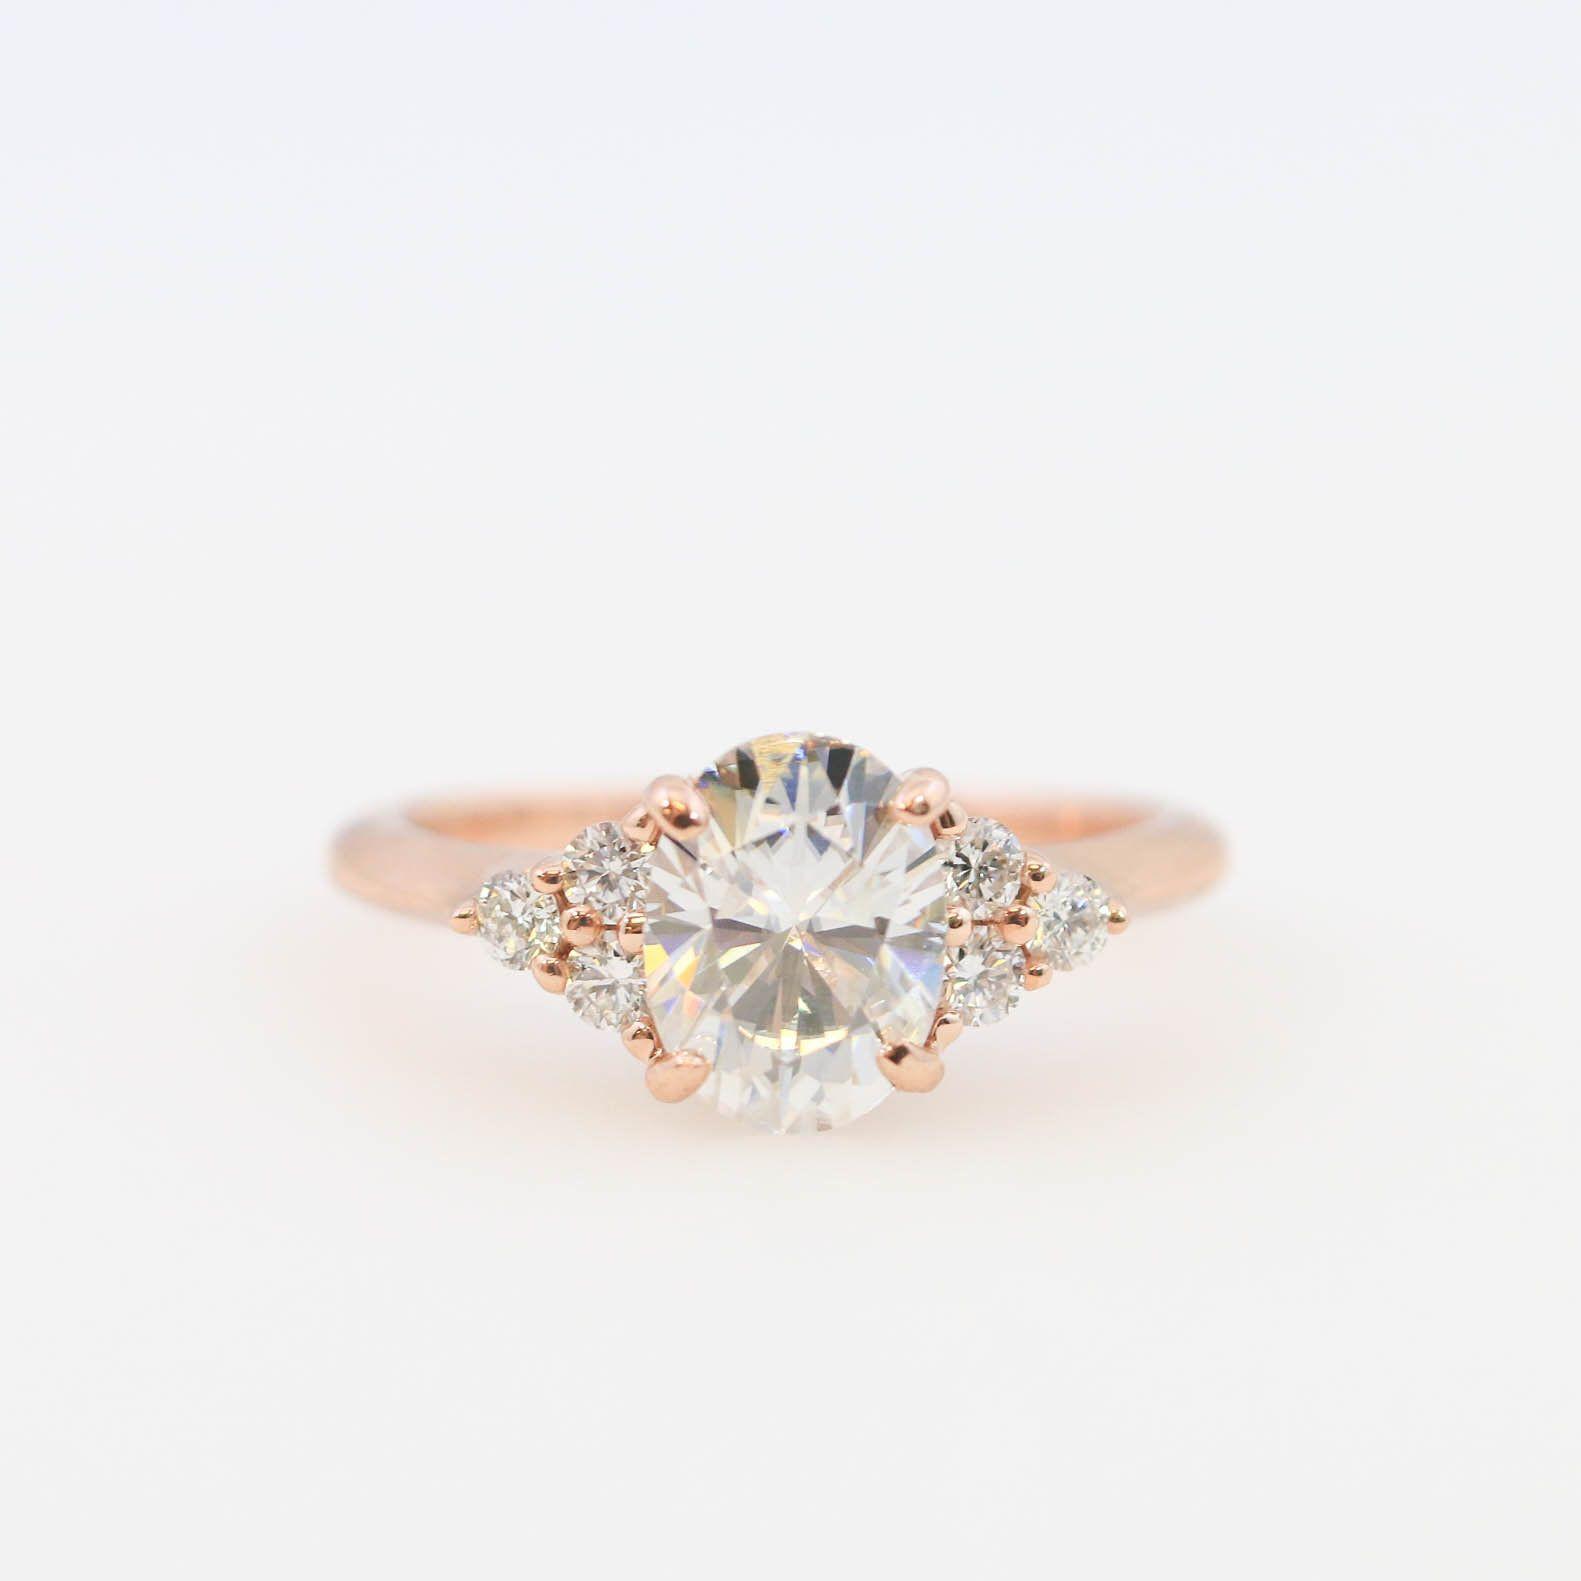 Moissanite engagement ring diamond engagement ring x oval